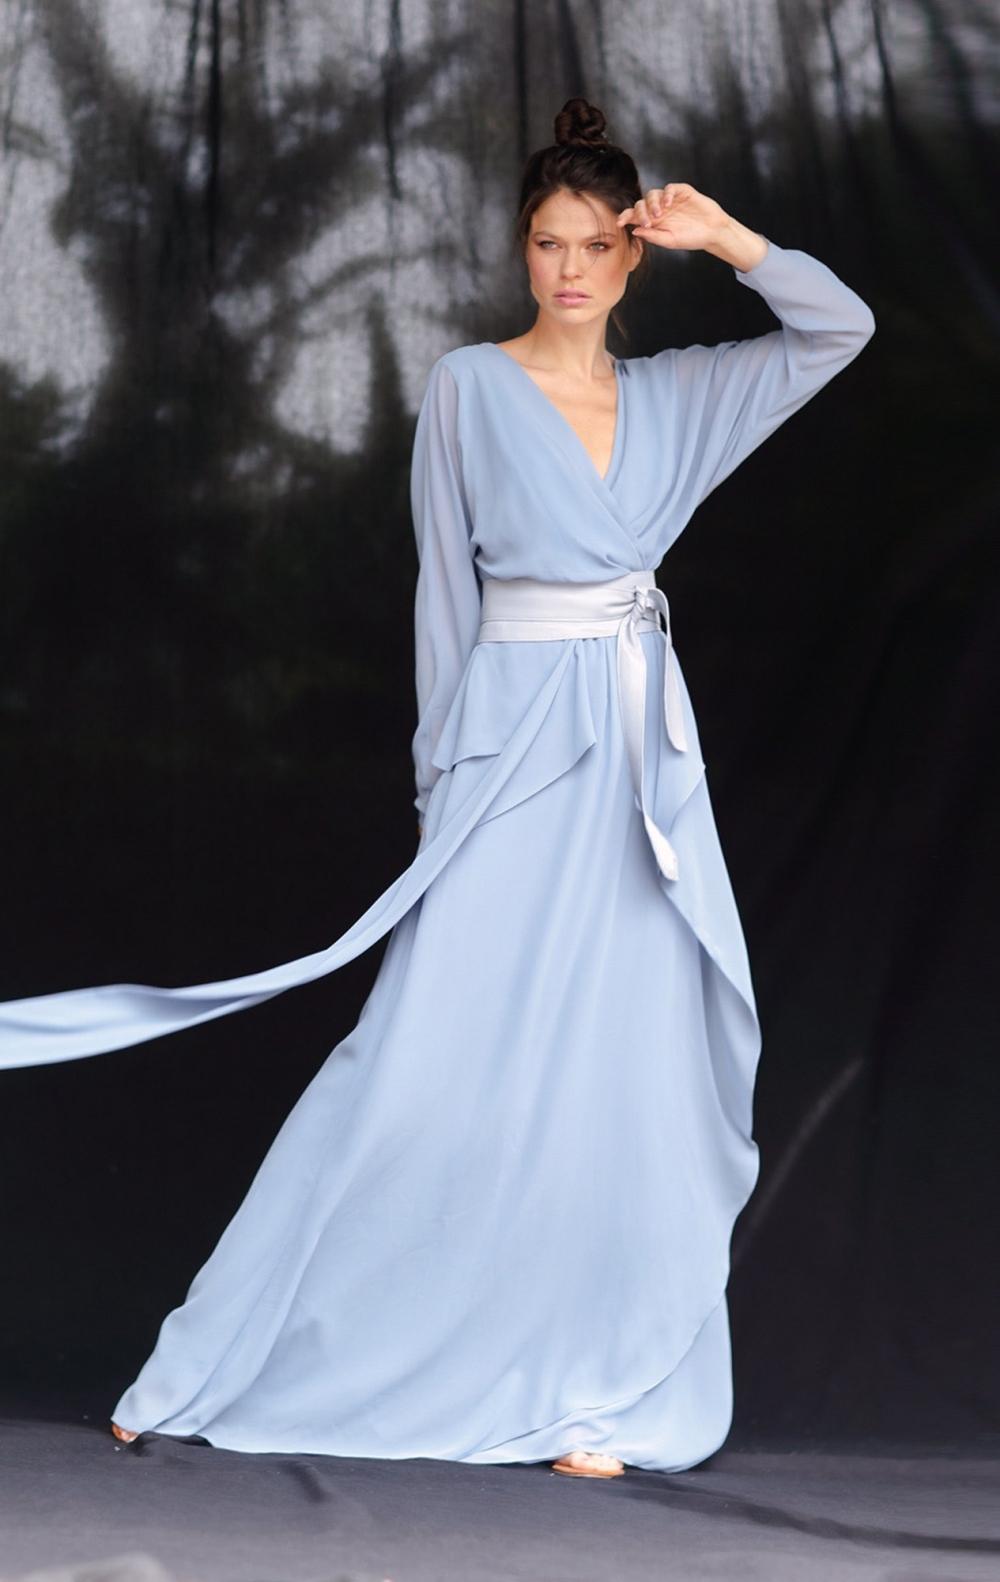 Vestido Musseline Festa Azul Claro  - Foto 1